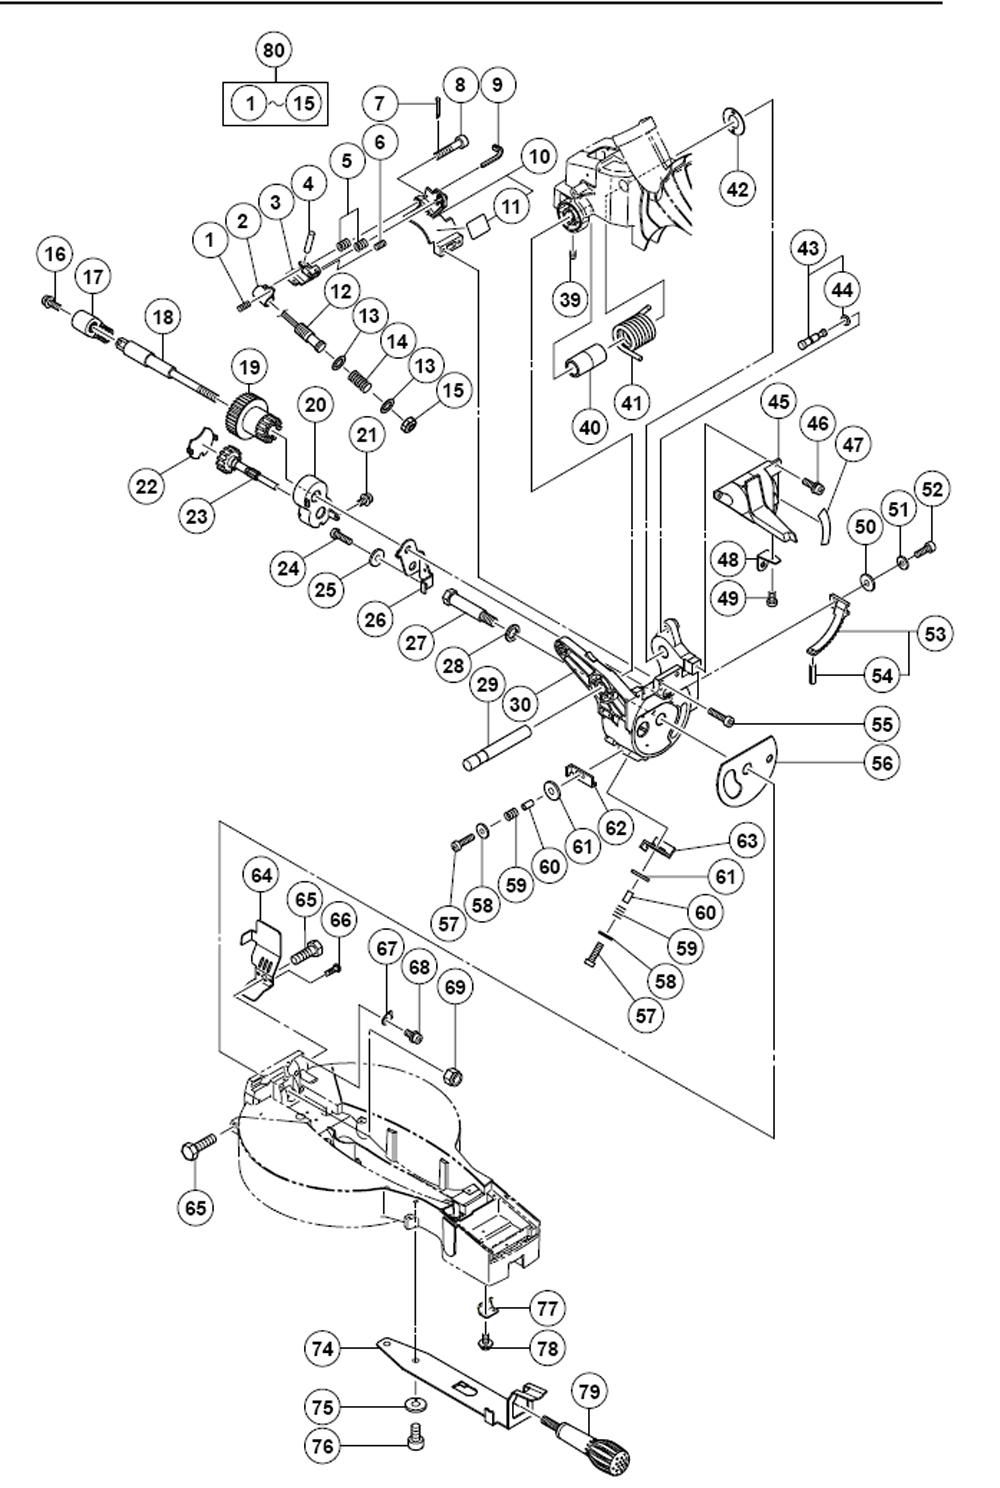 Buy Hitachi C12FCH 12 Inch Compound Miter with Laser ... Hitachi Tools Par